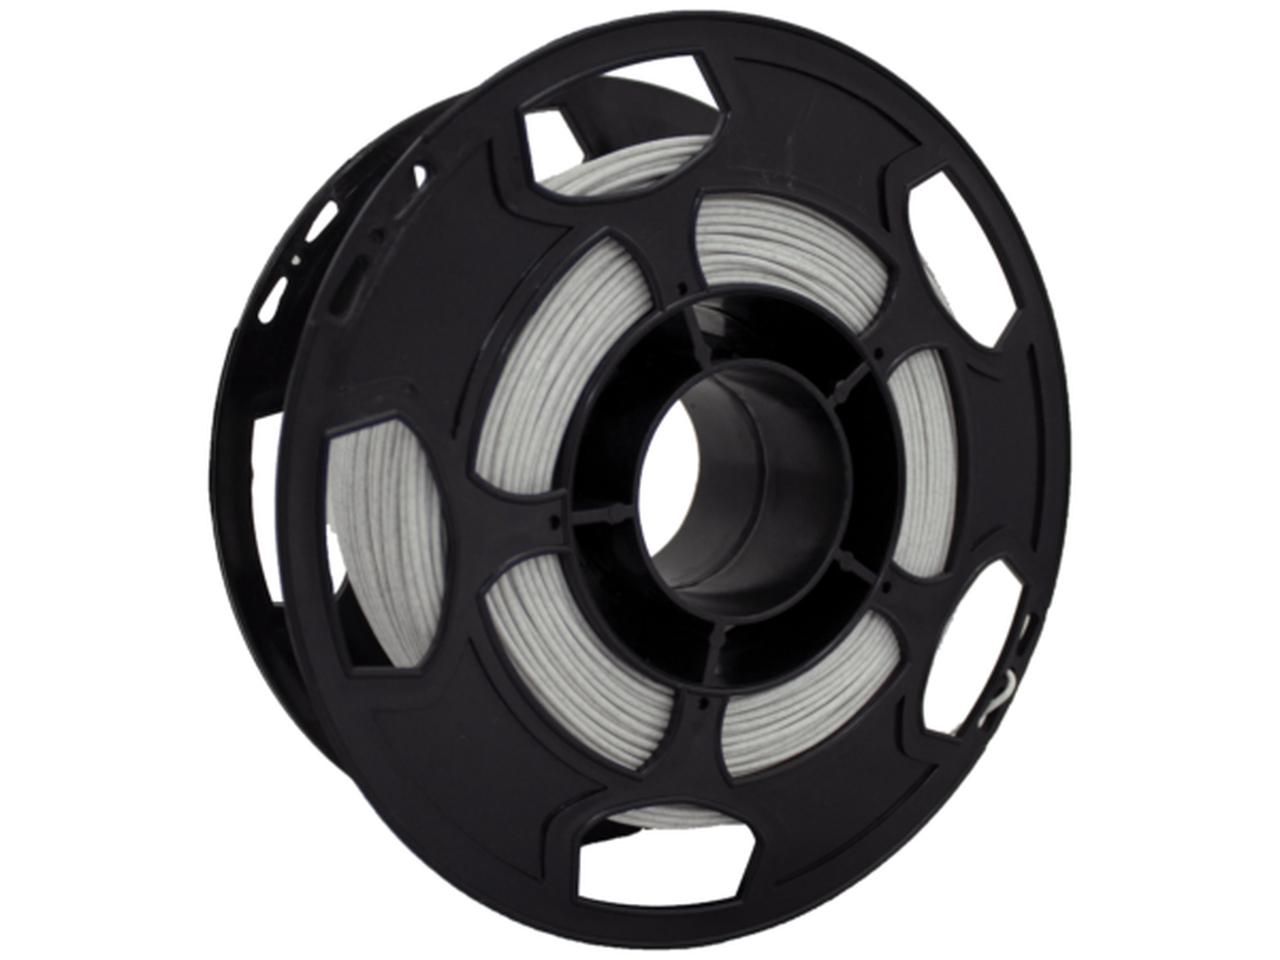 Filamento ABS Premium - Mármore - 3D Lab - 1.75mm - 500g